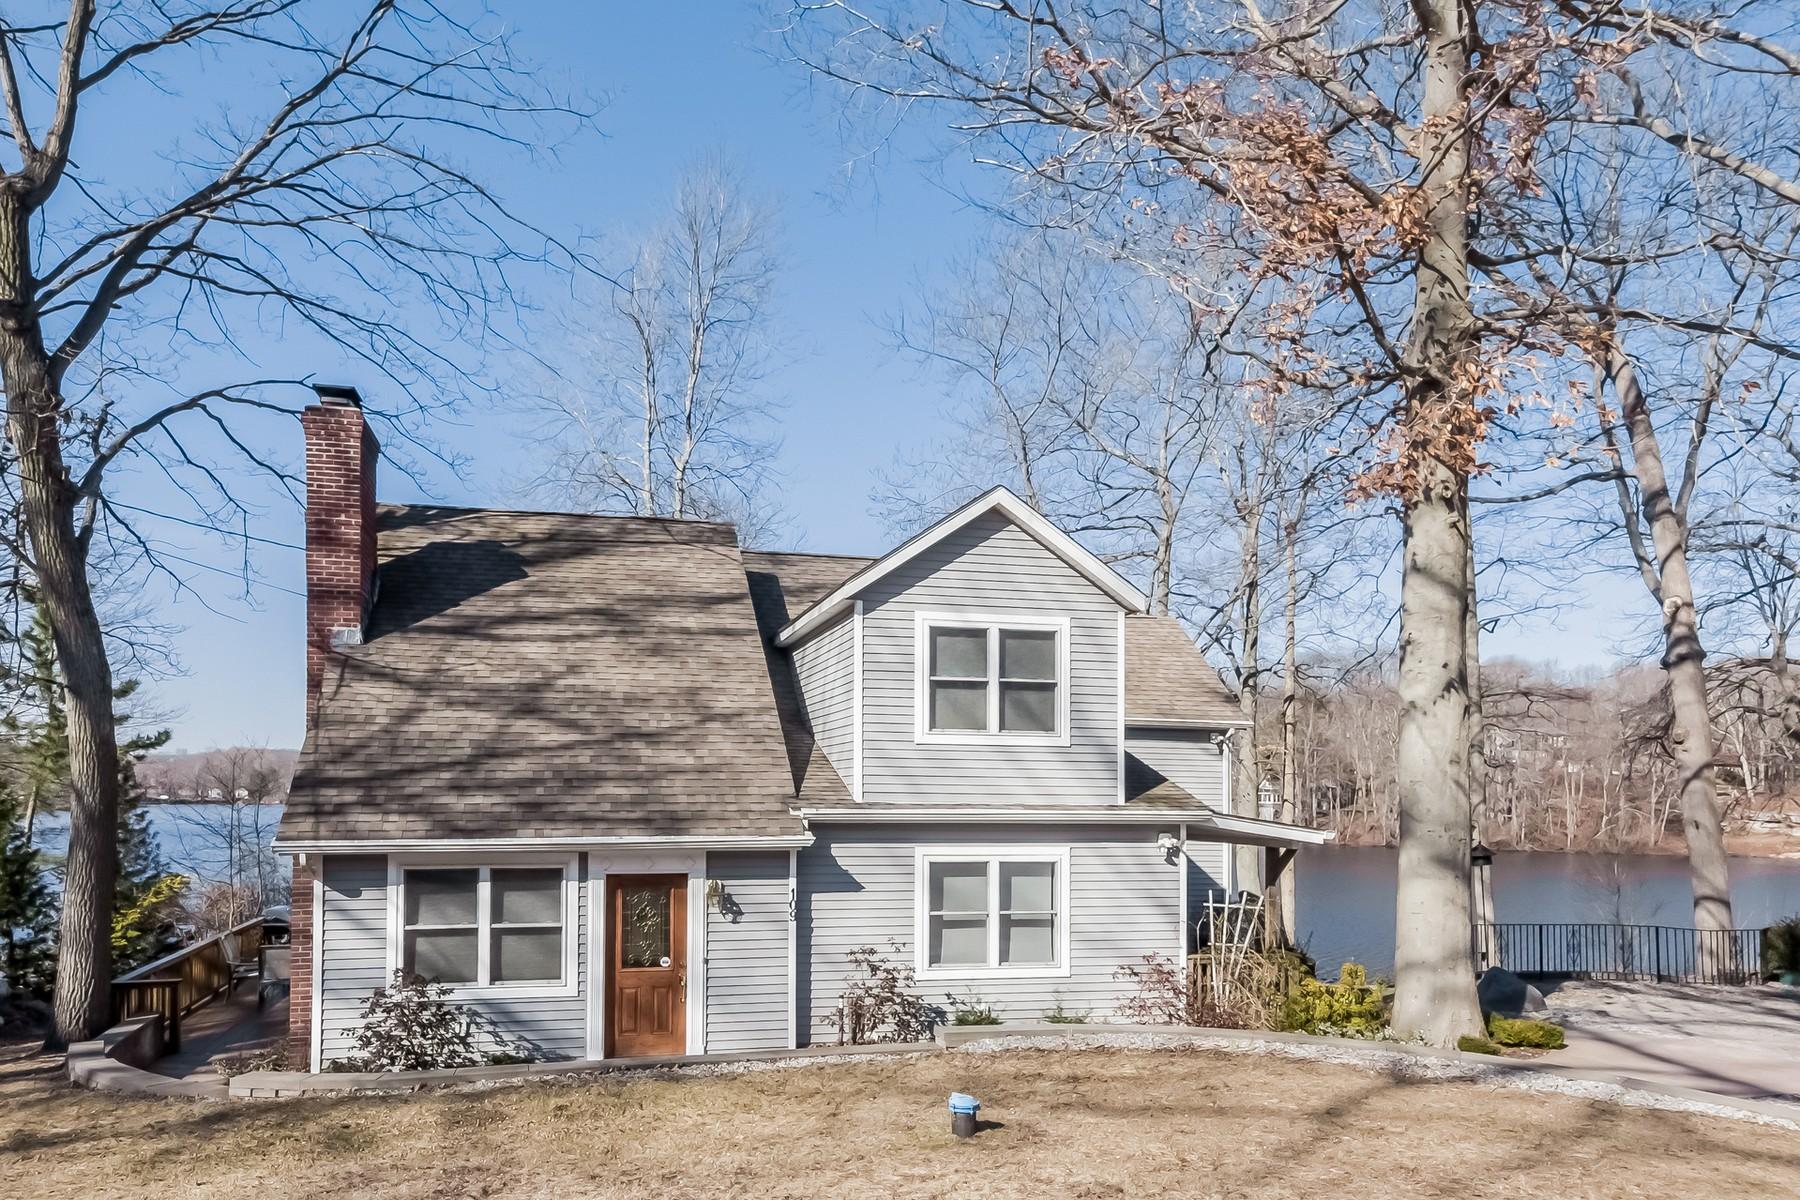 独户住宅 为 销售 在 Direct Waterfront Contemporary 109 East Shore Dr 哈达姆, 康涅狄格州, 06441 美国